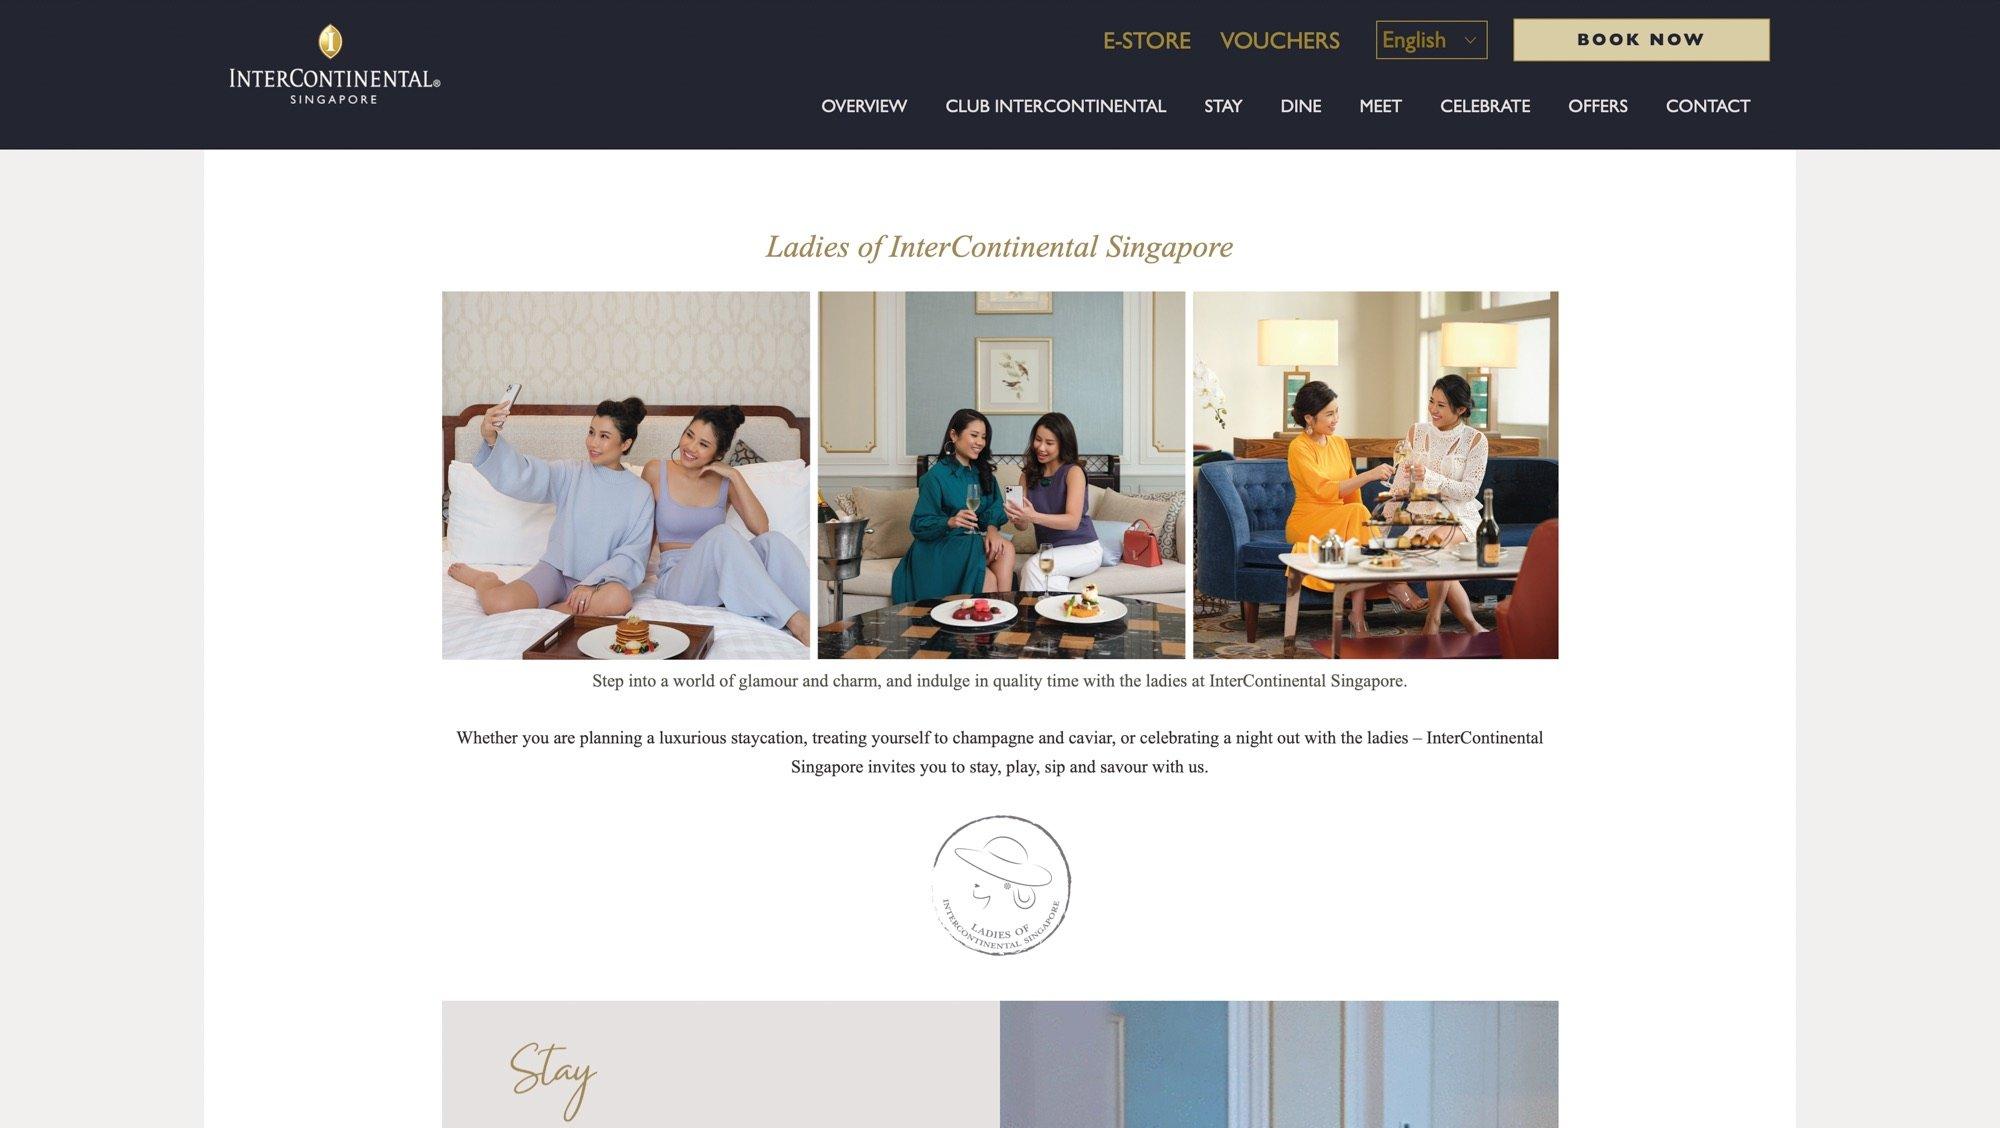 InterContinental Hotel Singapore Media Feature Hospitality Photography Jose Jeuland-17